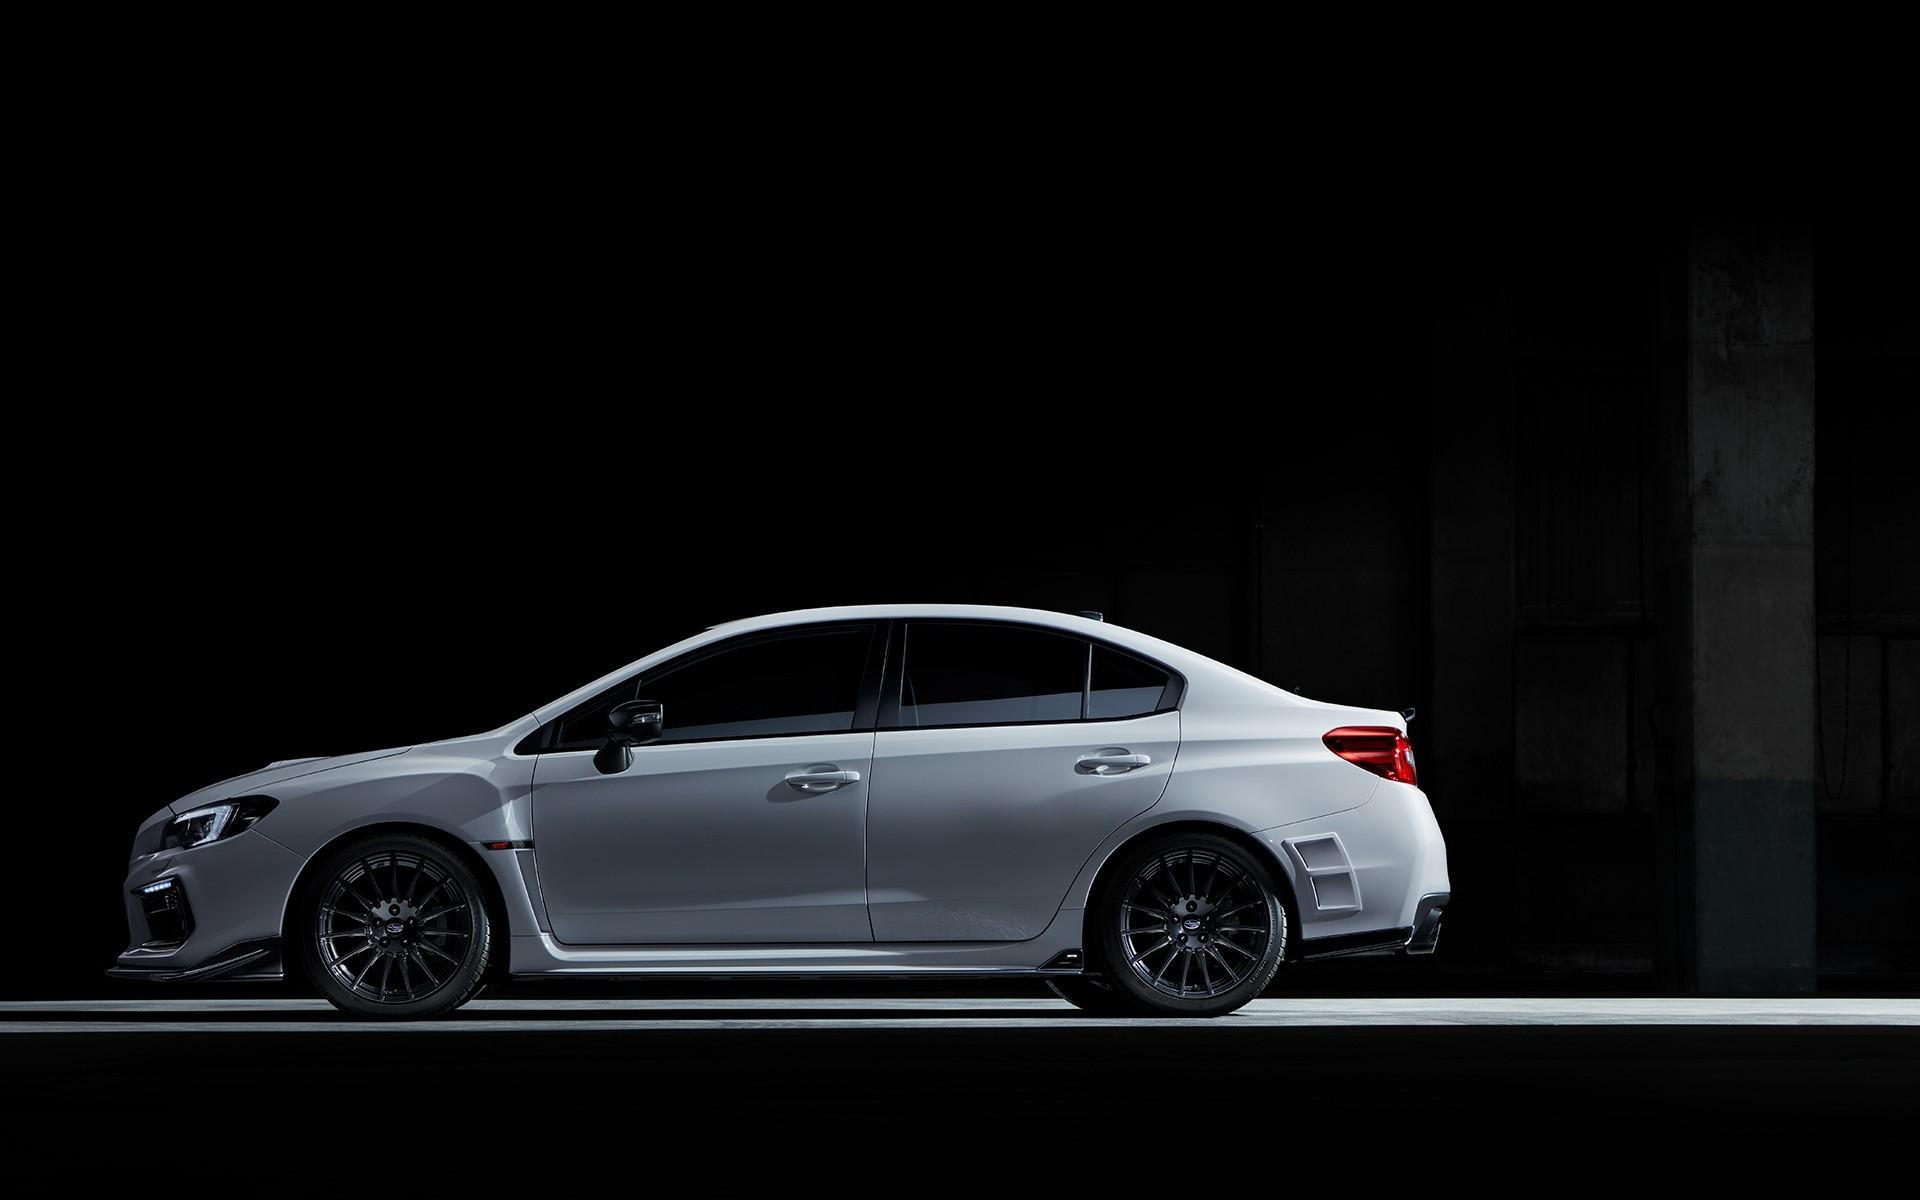 Subaru WRX S4 STI Sport EyeSight 2021 сбоку